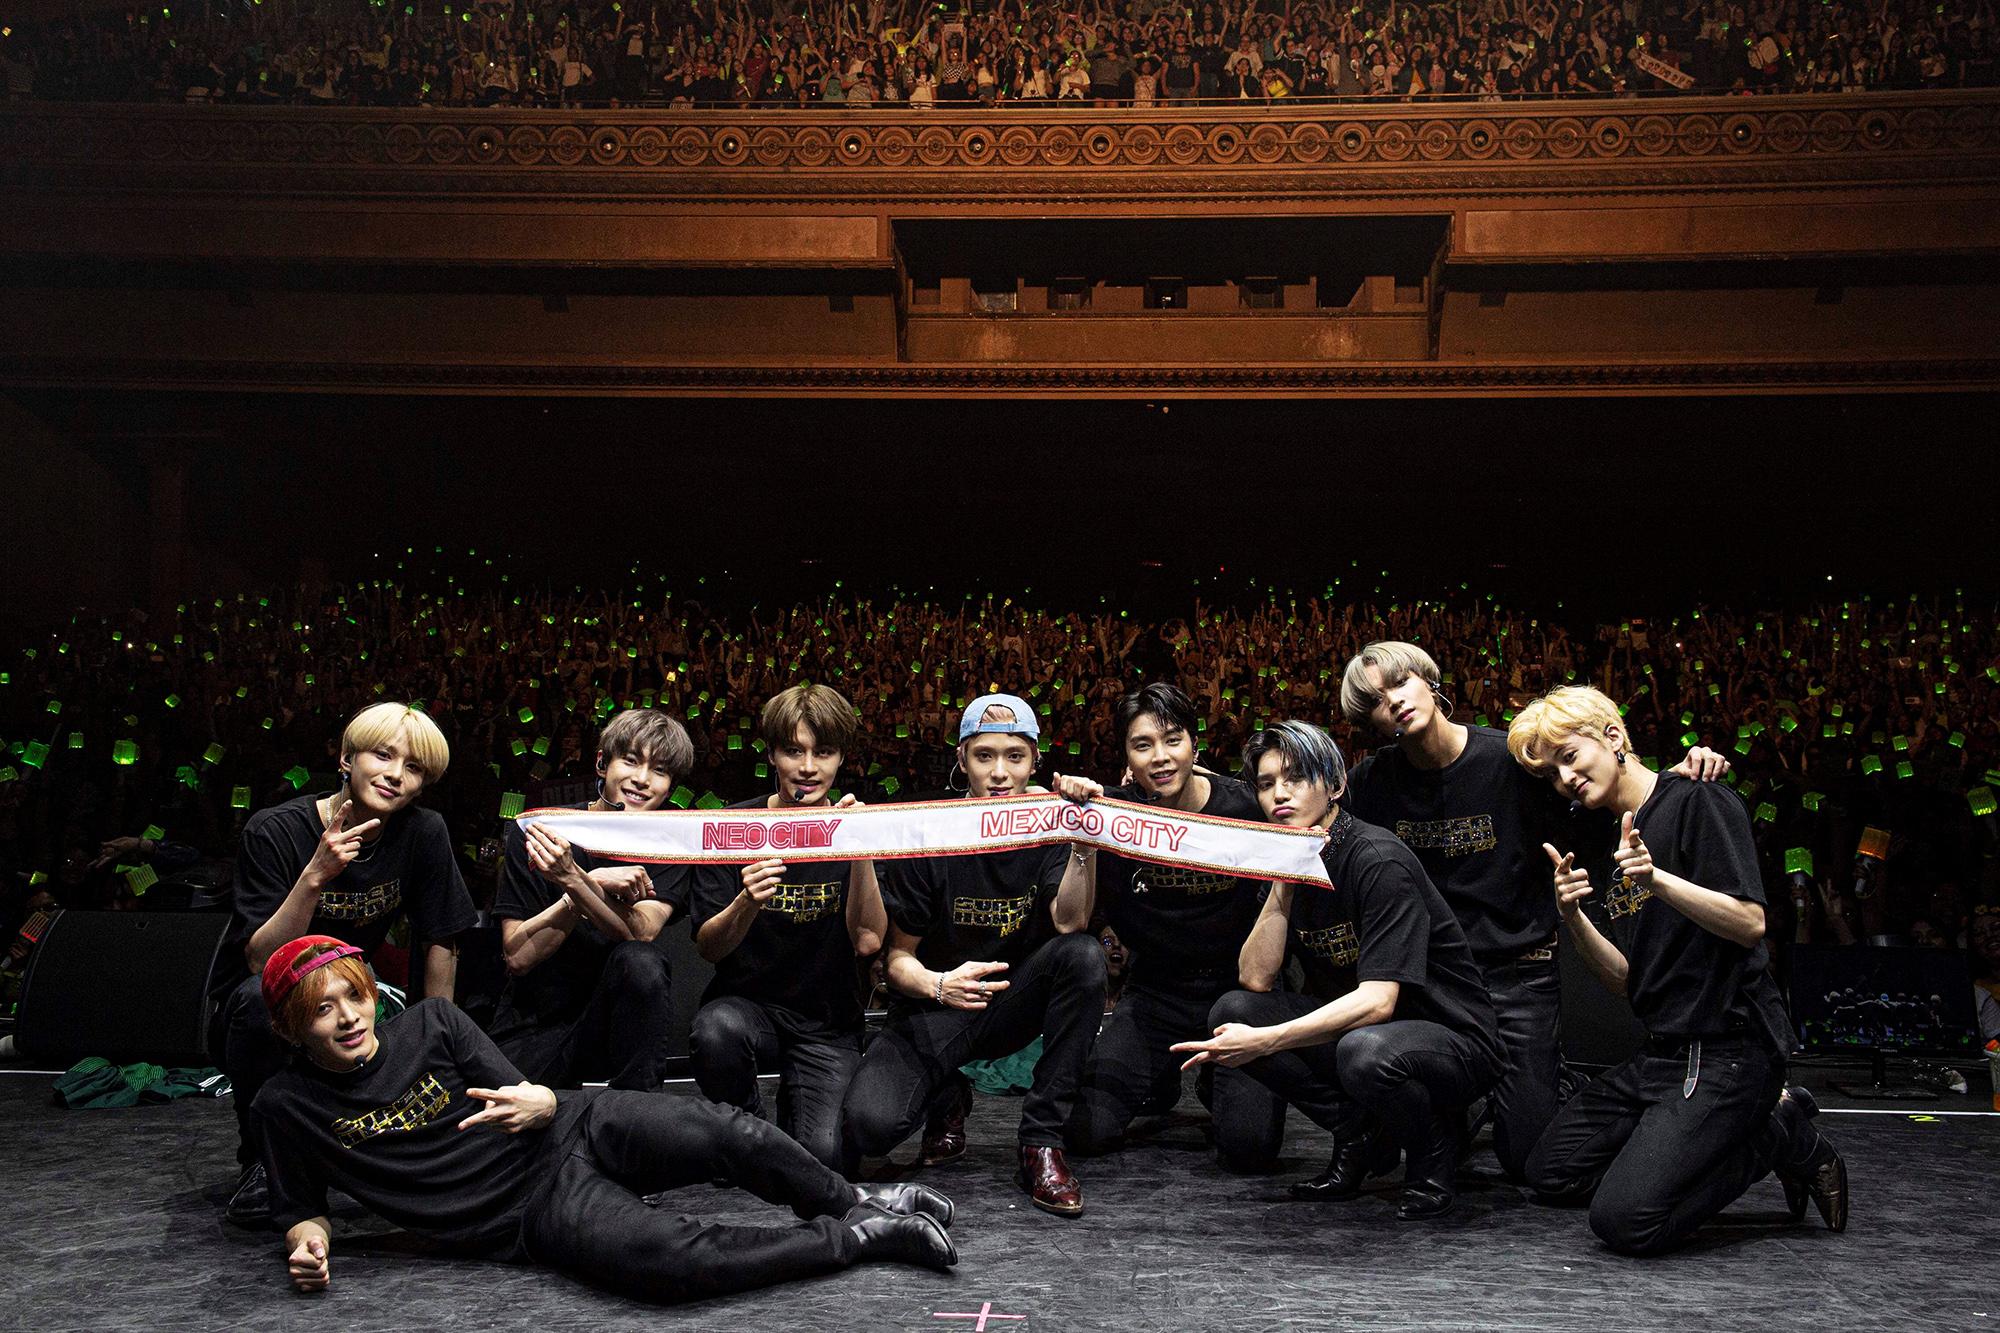 NCT 127北美之后使南美沸腾!墨西哥演唱会门票全席售罄